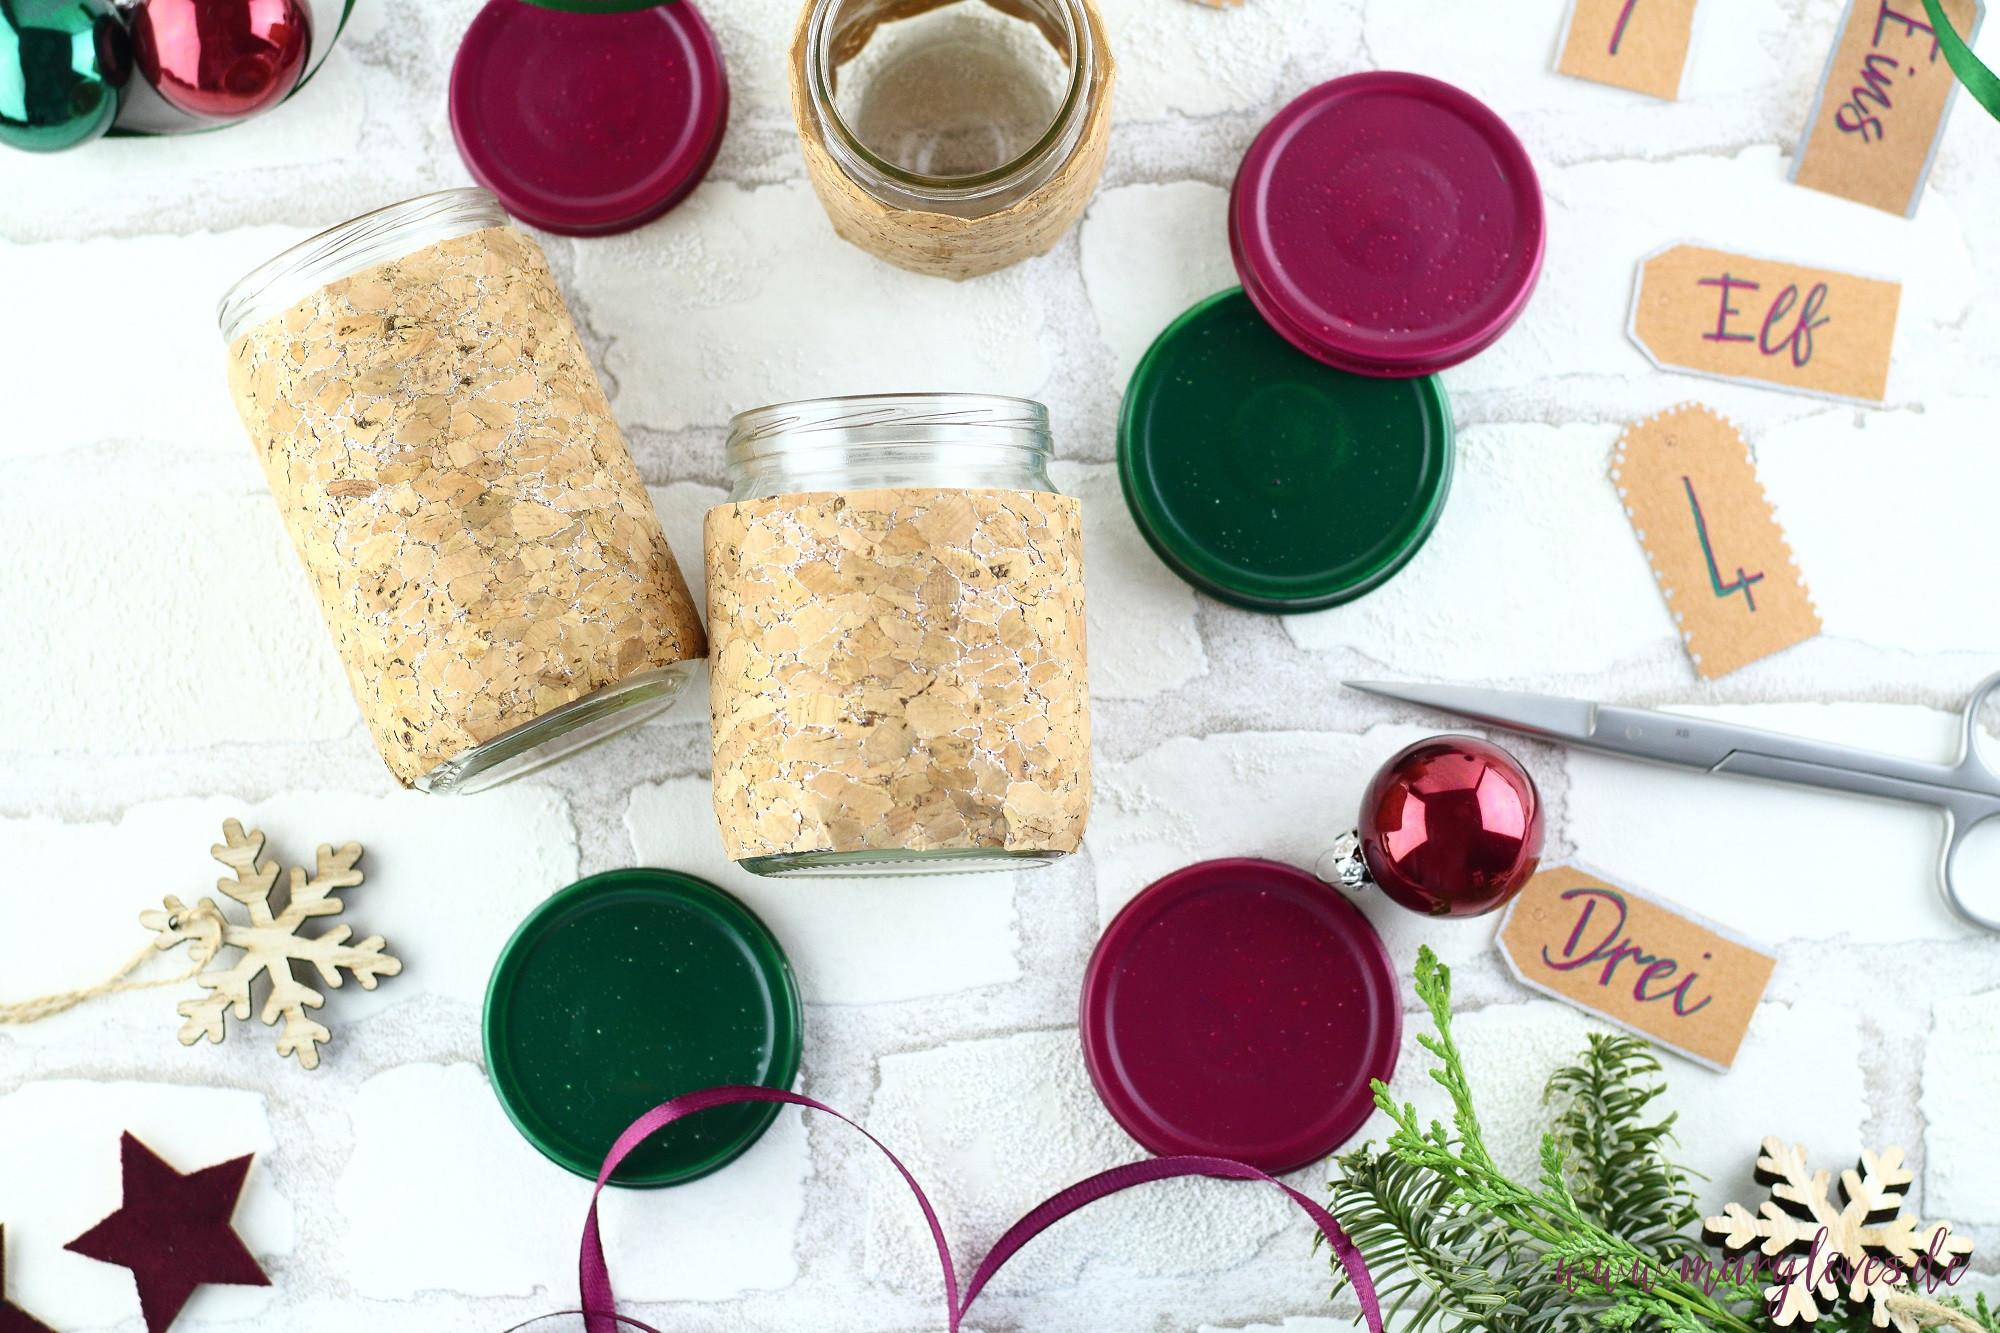 DIY Upcycling Adventskalender dekorieren & gestalten